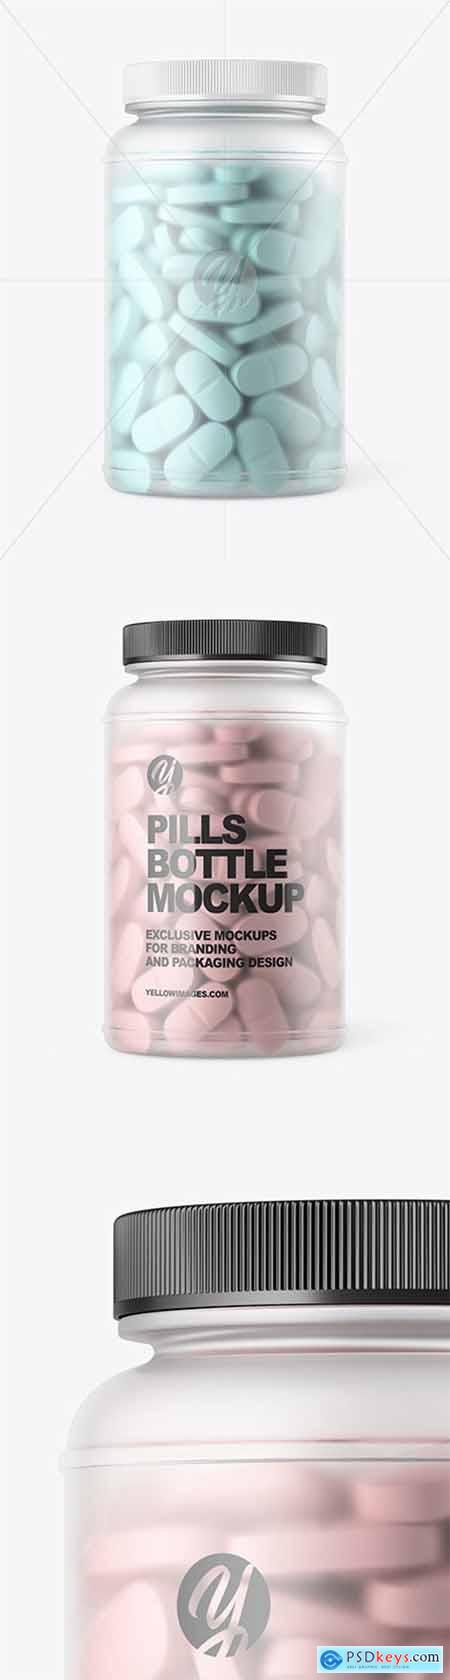 Frosted Pills Bottle Mockup 60399